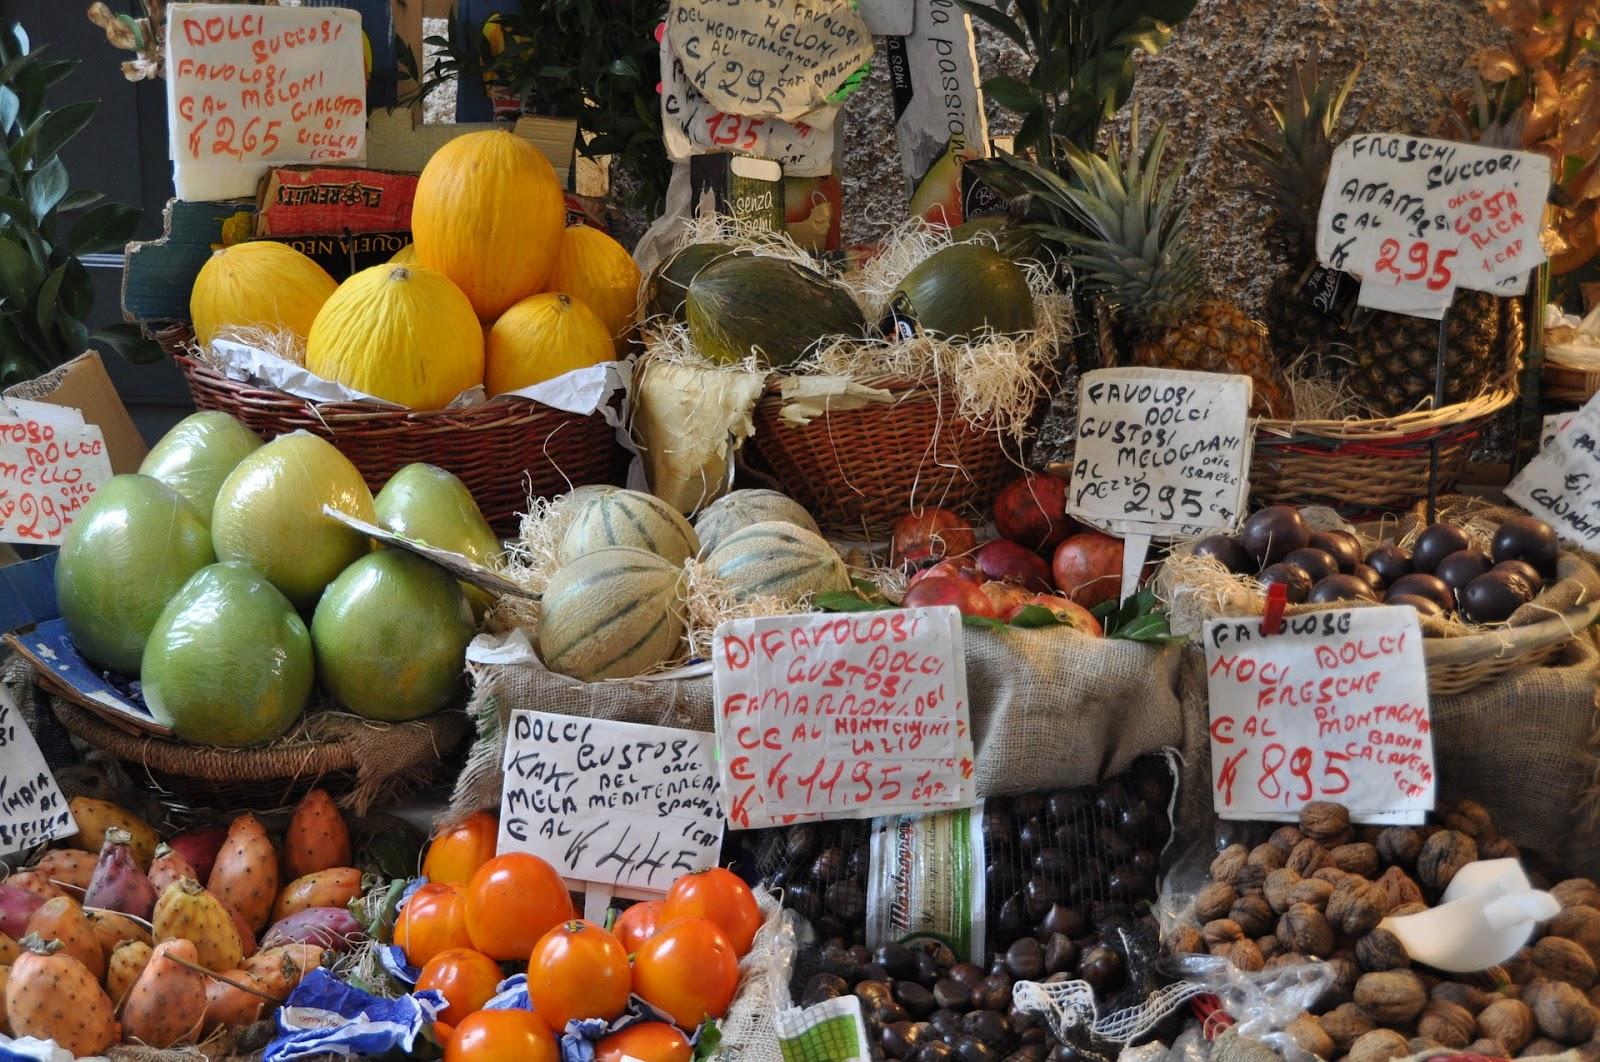 fruits-1745280_1920.jpg